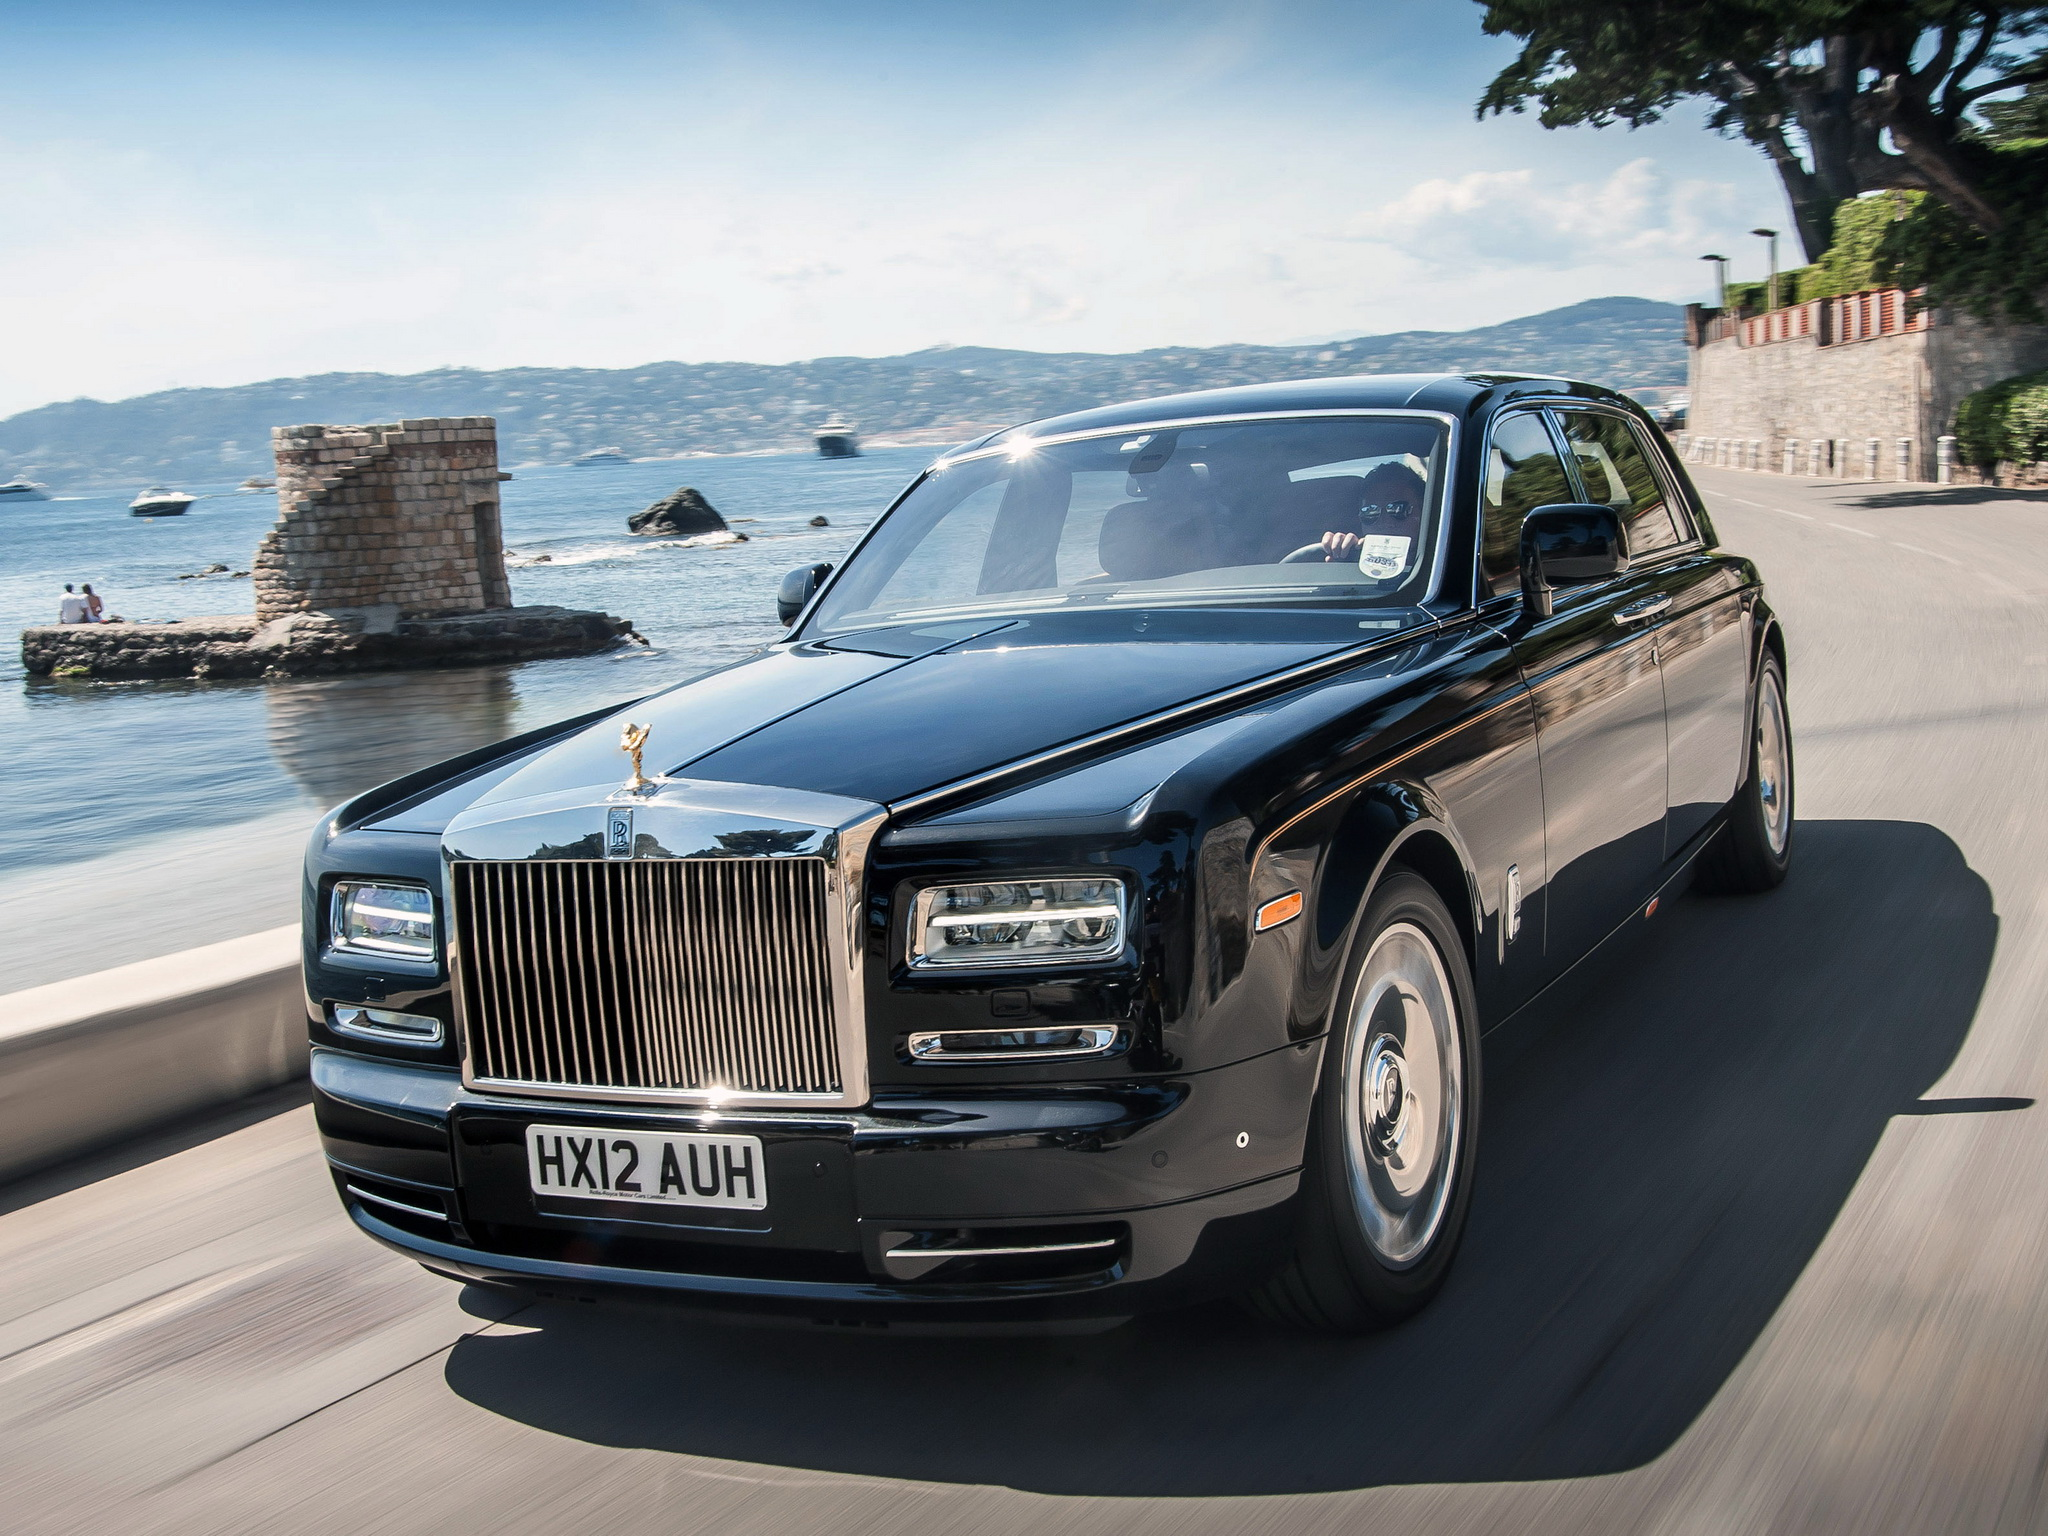 Rolls Royce Phantom Free Wallpaper For Desktop